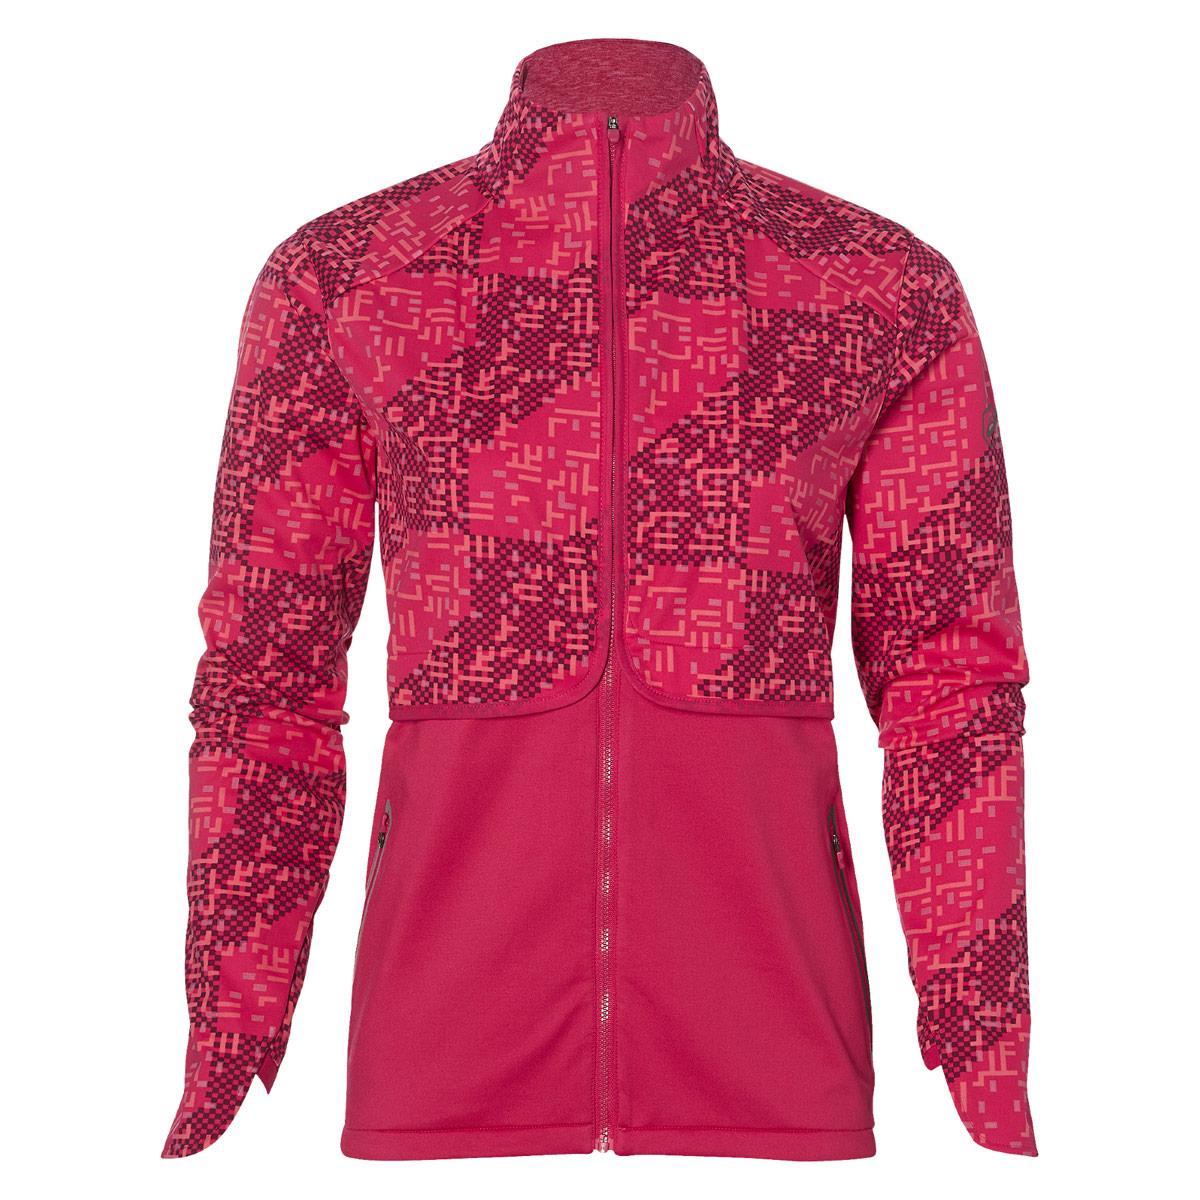 Mujer Winter Show 21run Asics Jacket Rosa Lite Running Chaquetas Para De  PFqqUA8wx ccc8660dc6e